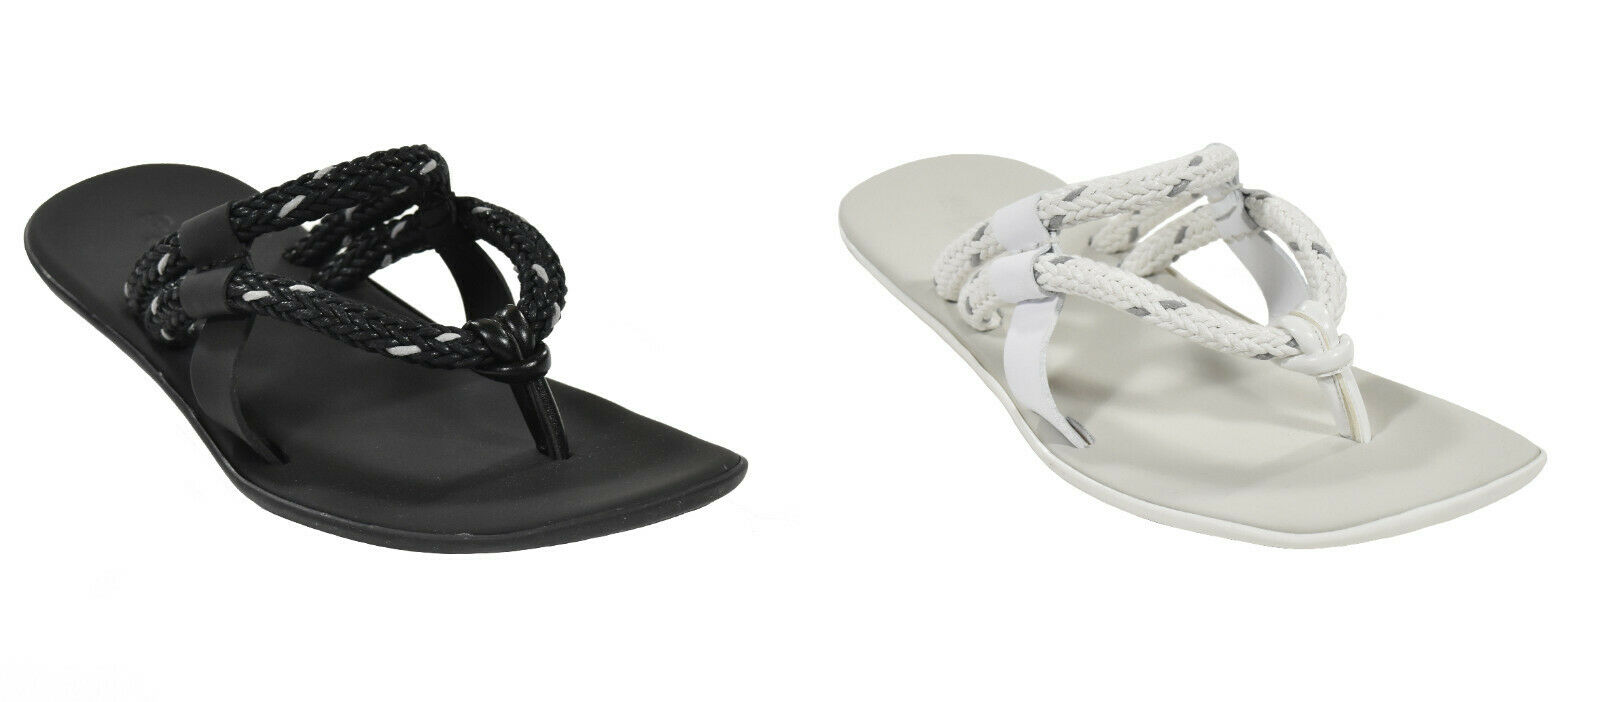 Ralph Lauren viola  Label Leather Rubber Lery Thong Sandals New  esclusivo